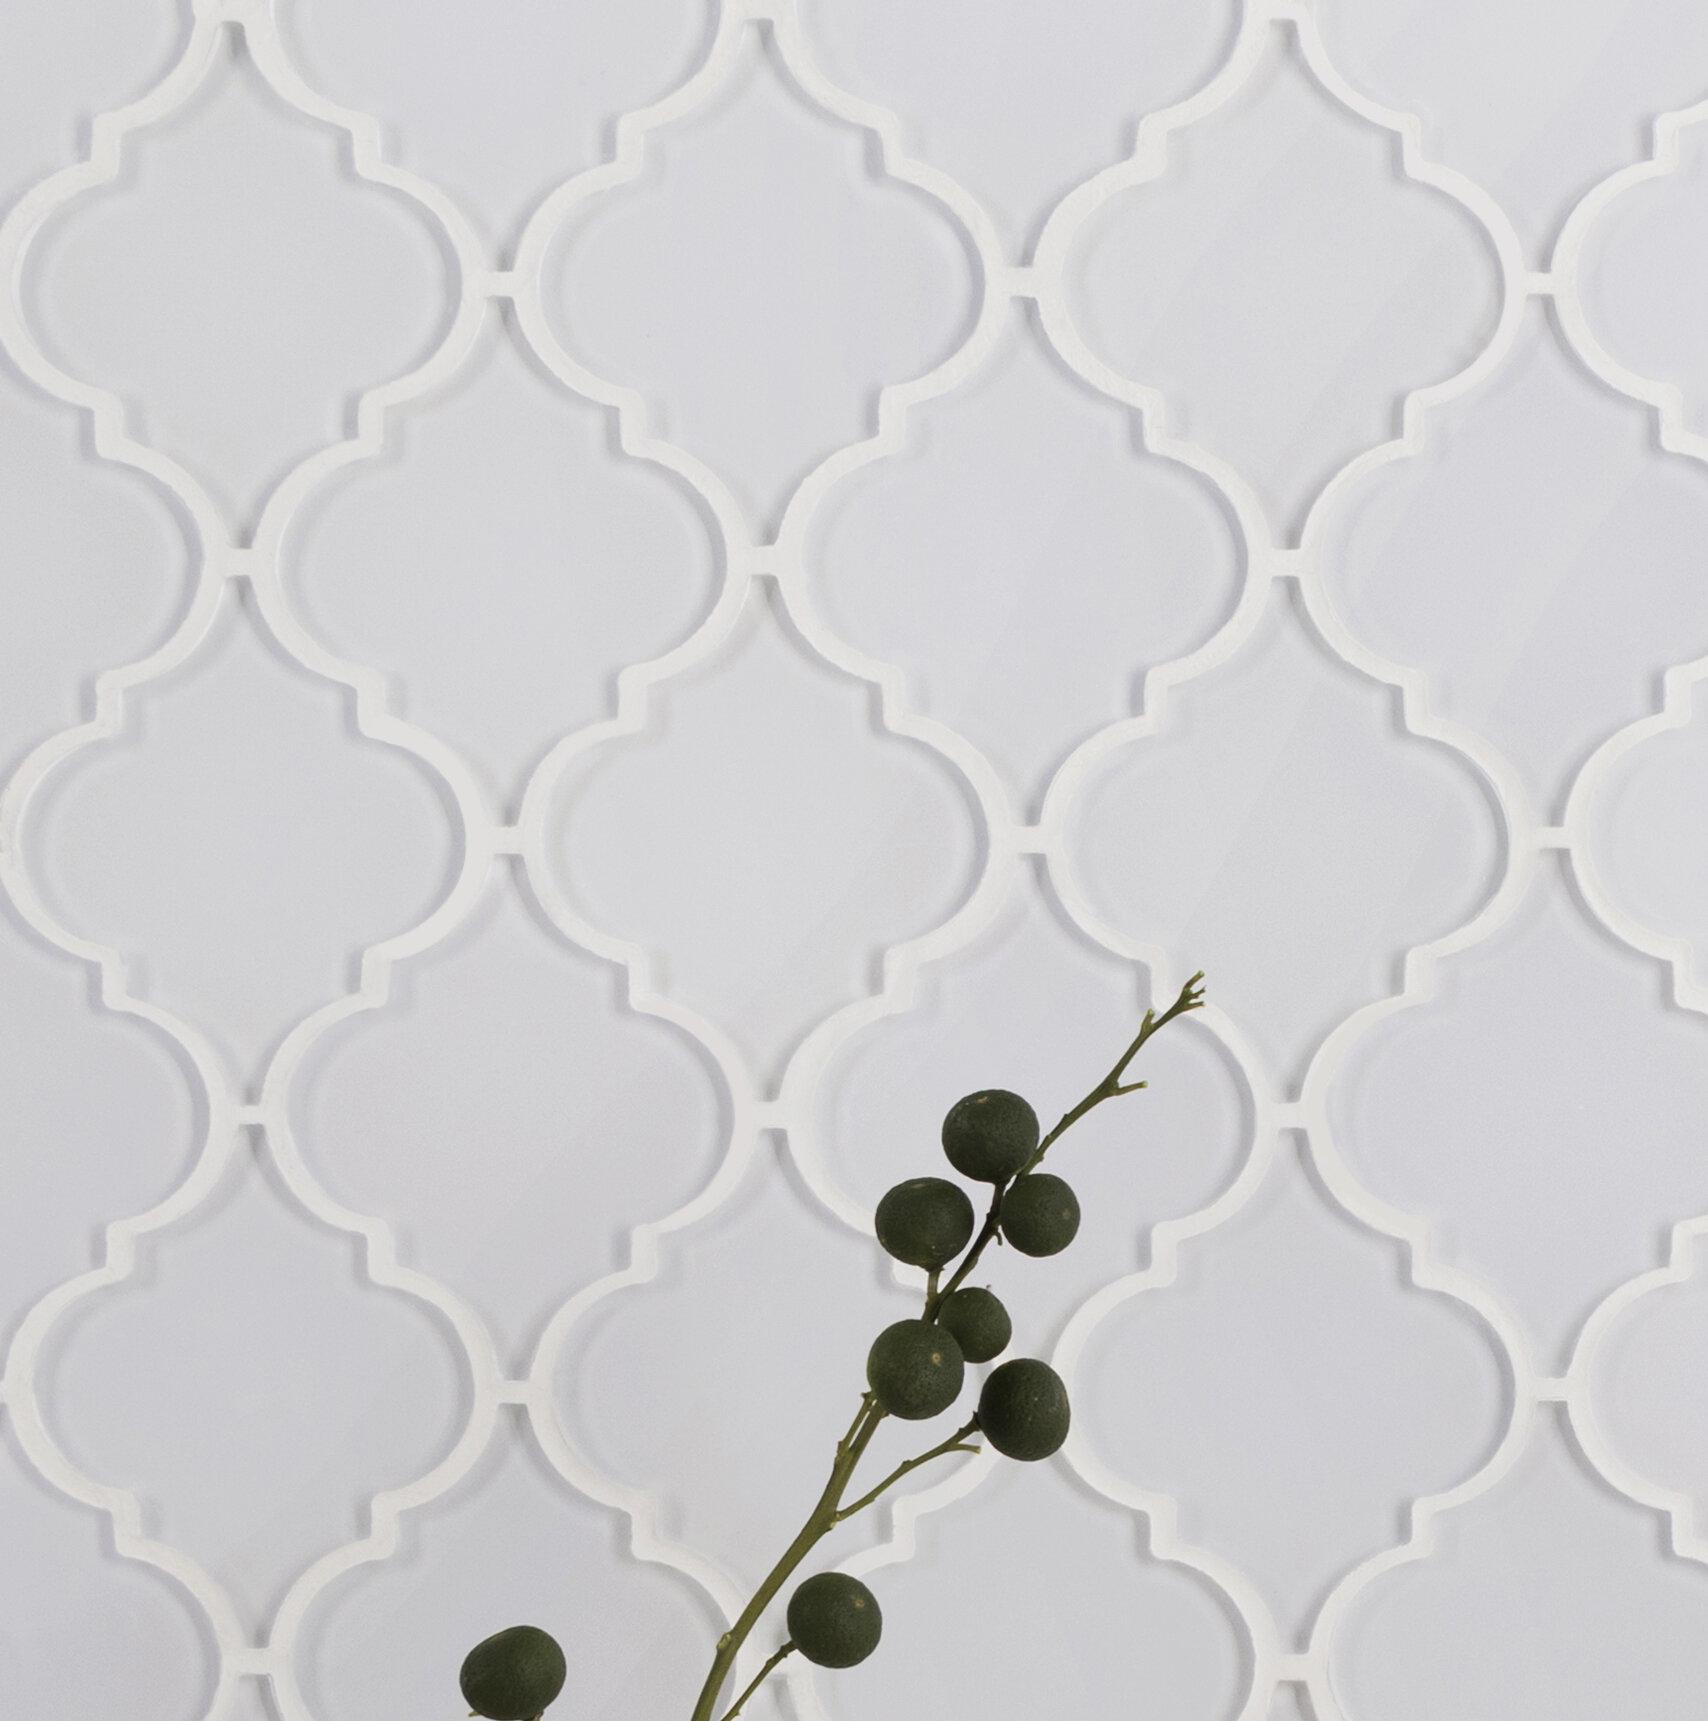 Ws Tiles Water Jet Series 3 5 X 4 25 Gl Mosaic Tile In White Reviews Wayfair